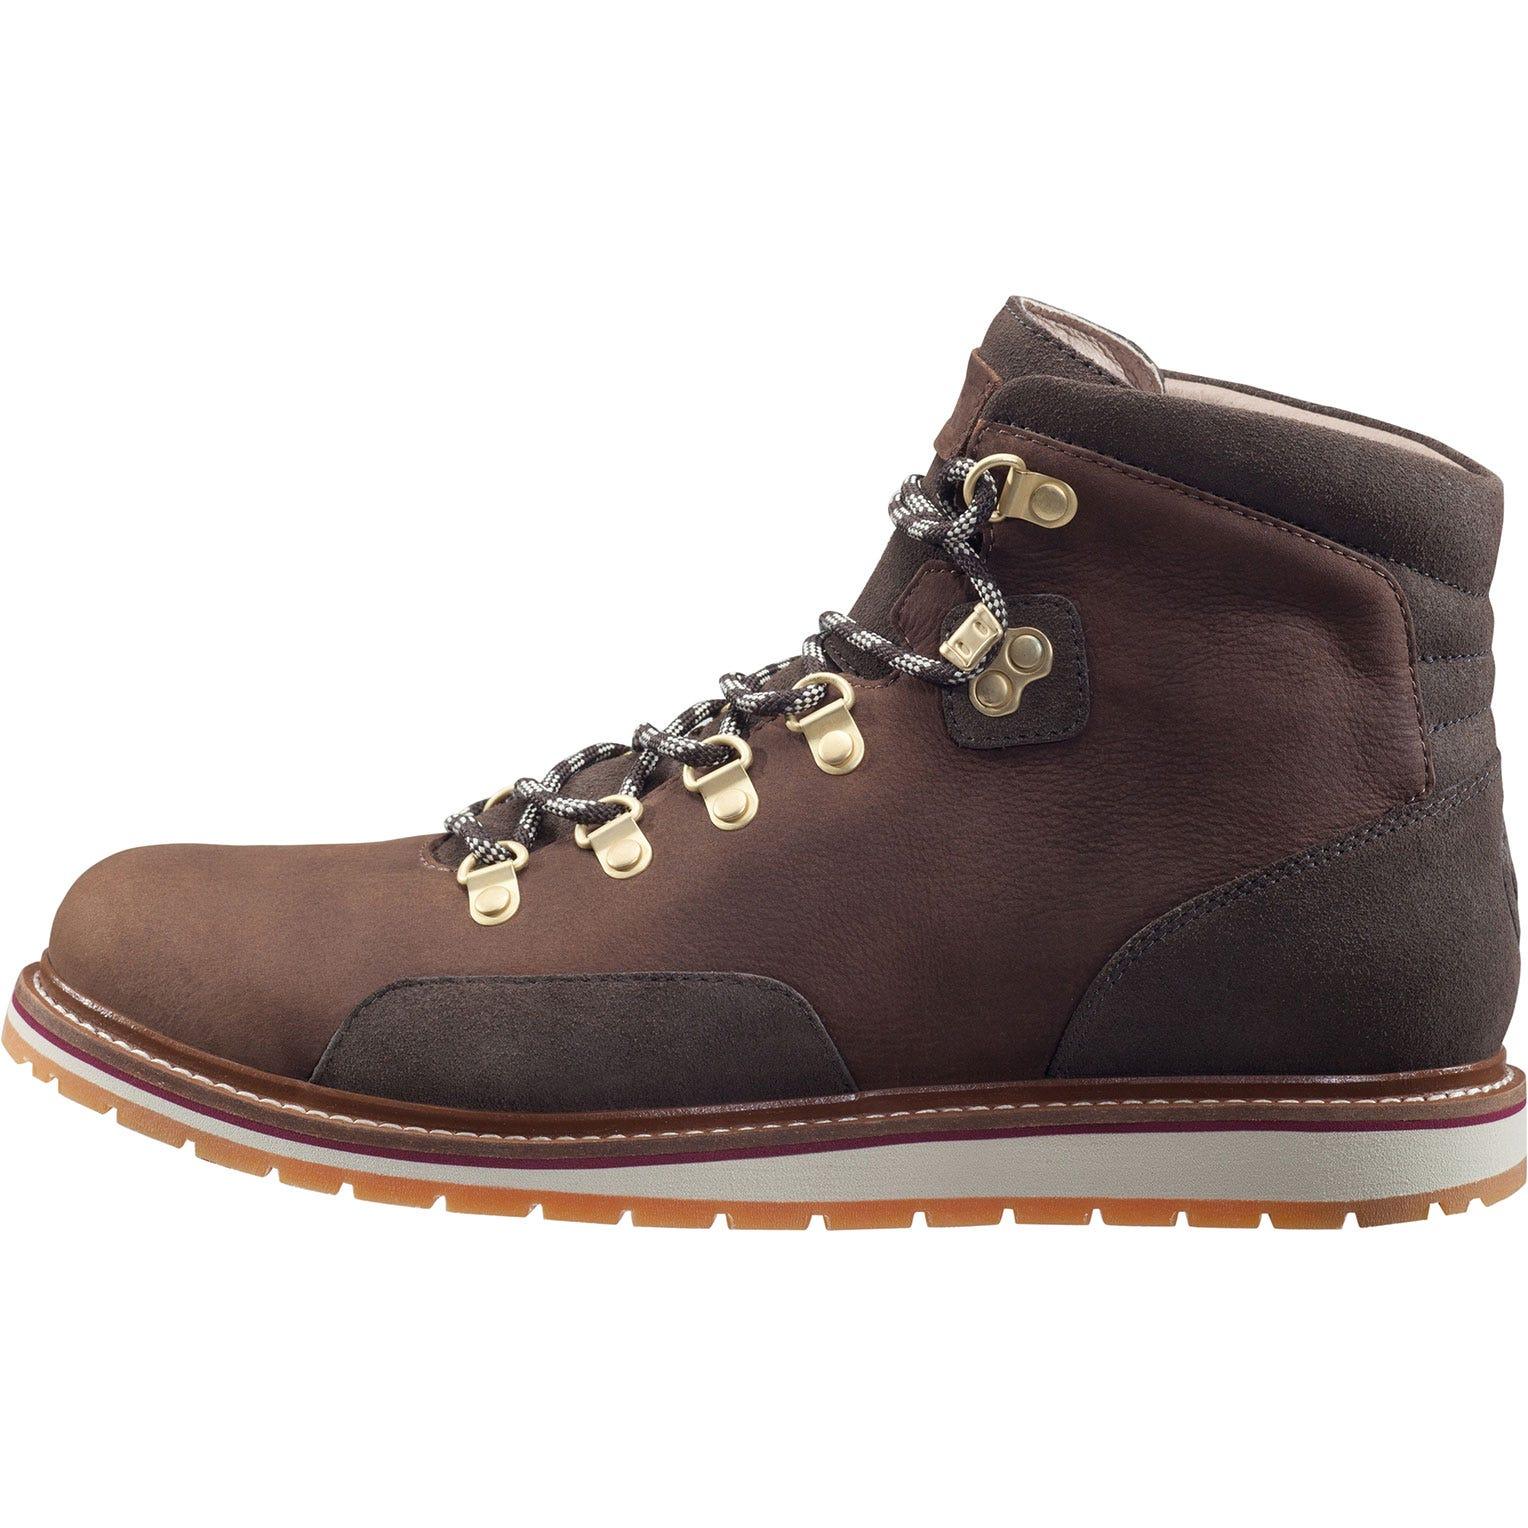 Helly Hansen Klosters Mens Winter Boot Brown 42/8.5